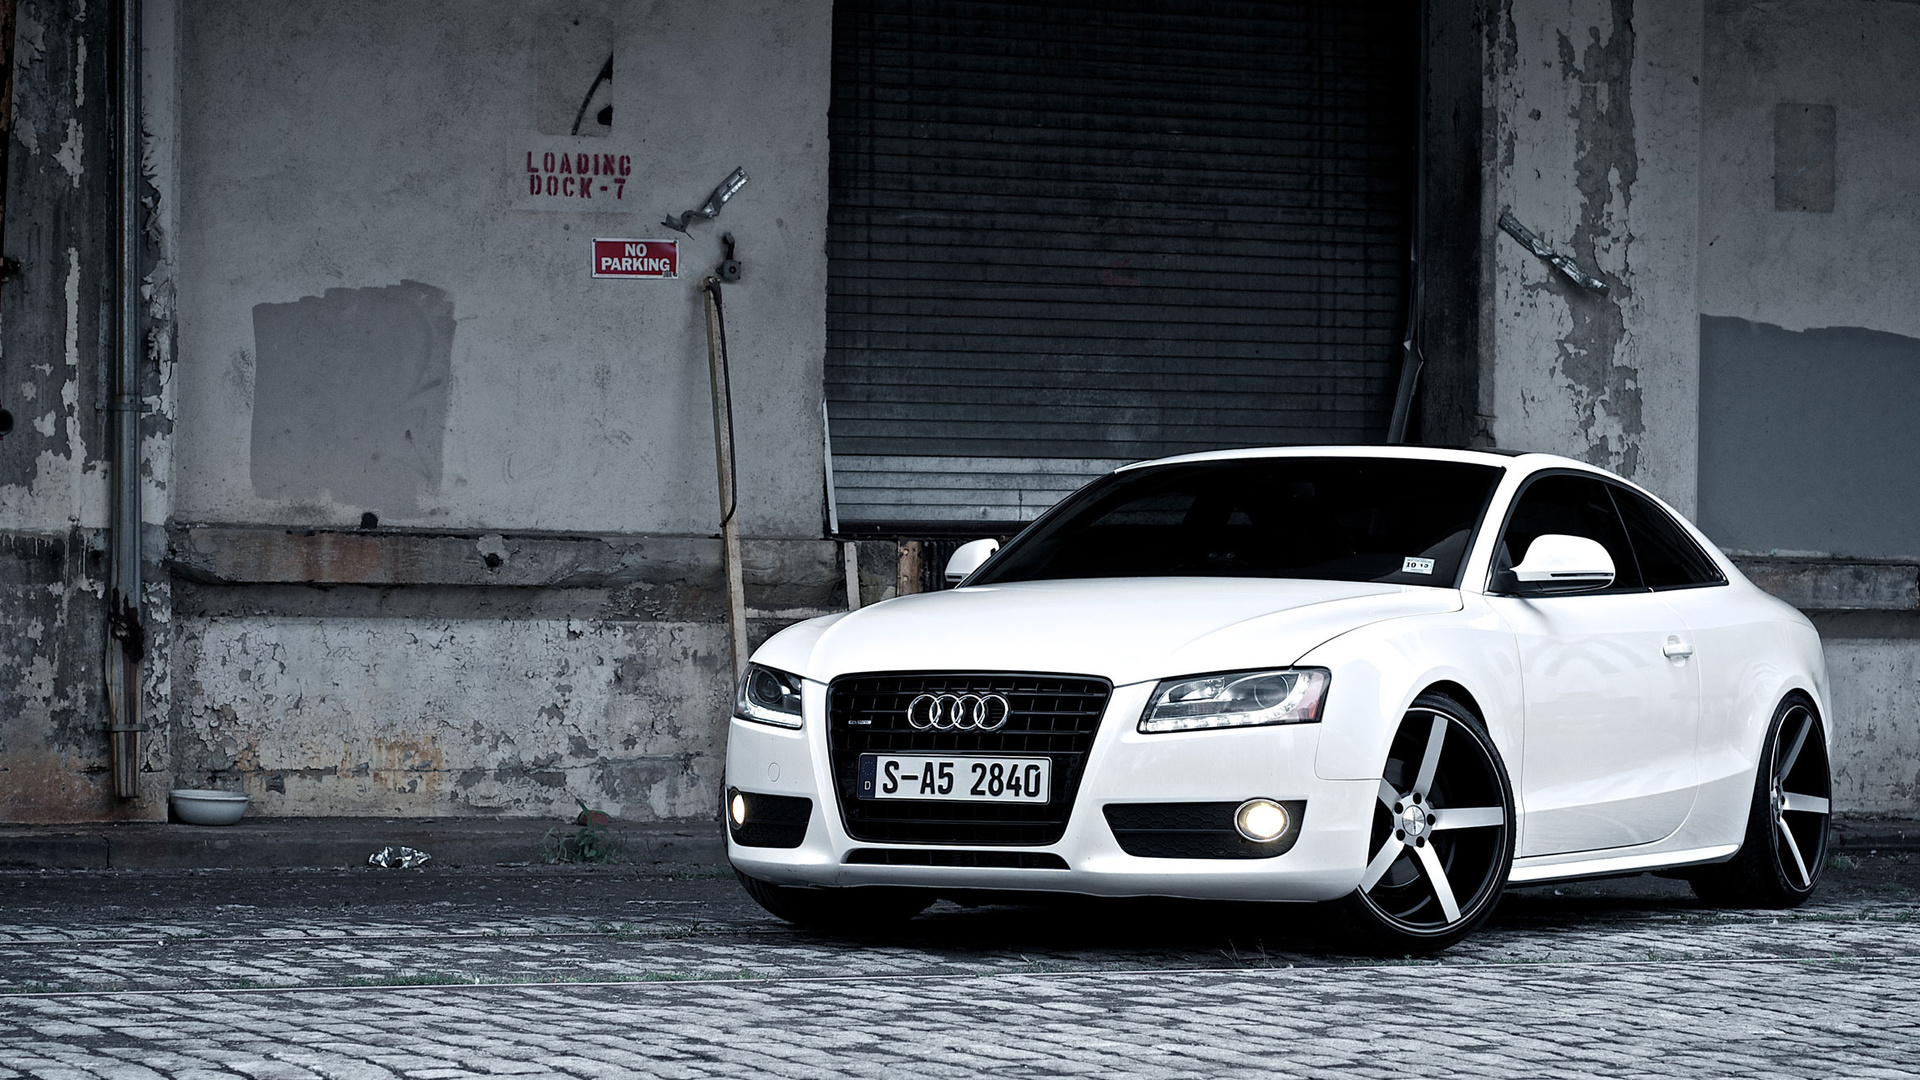 Black Car Wallpapers For Mobile White Audi S5 Wallpaper Photos Wallpaper Wallpaperlepi